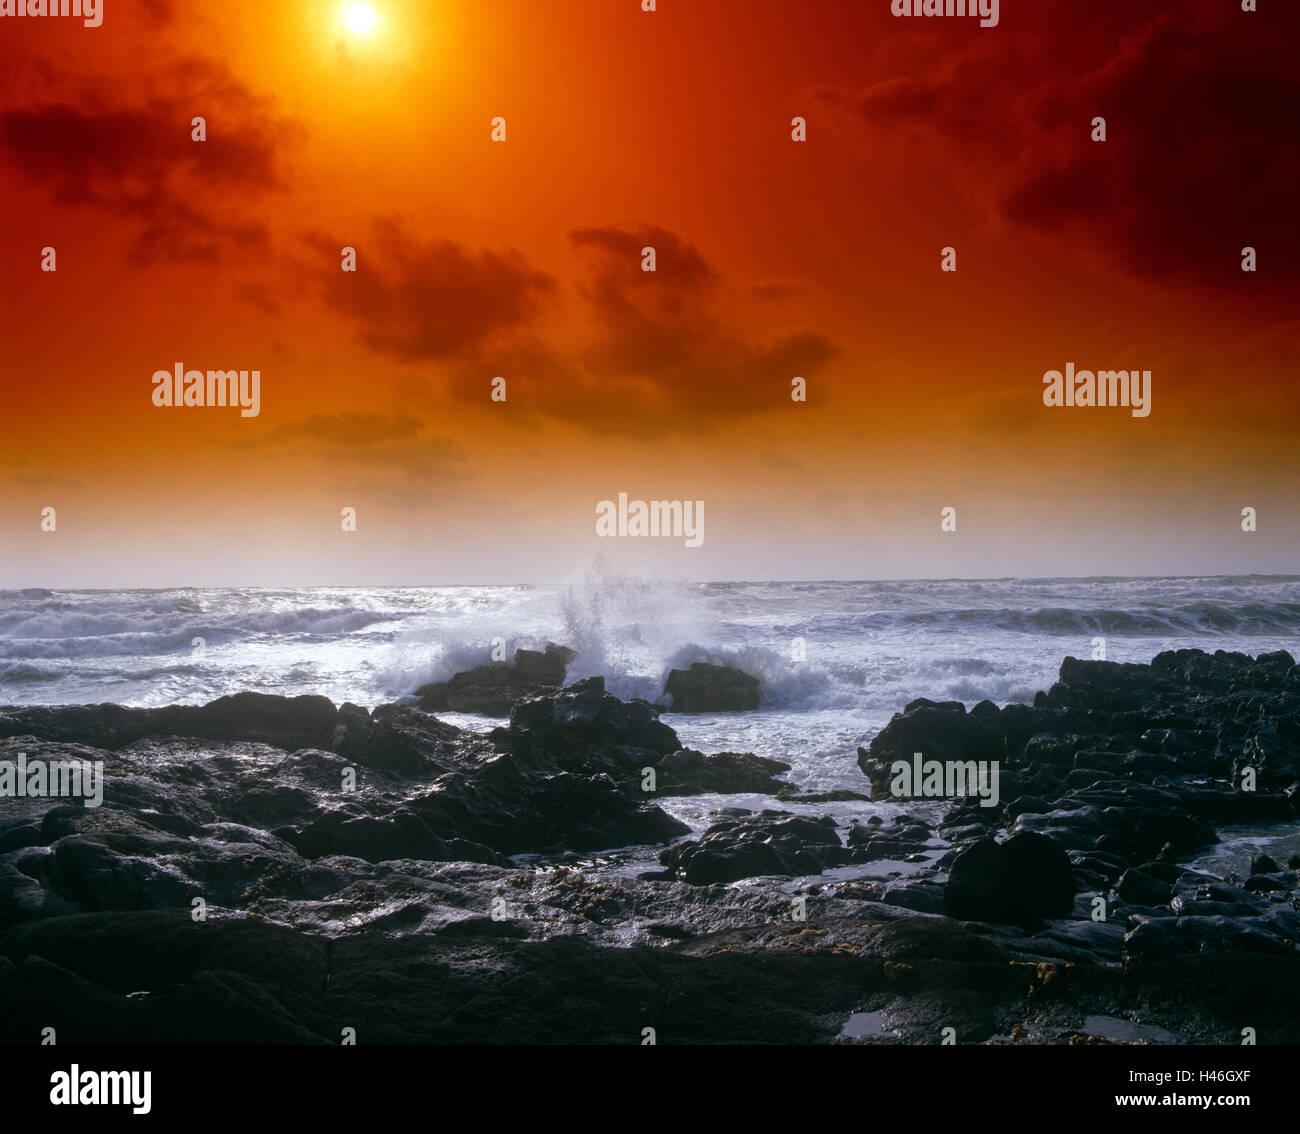 Sunset over sea rocks - Stock Image